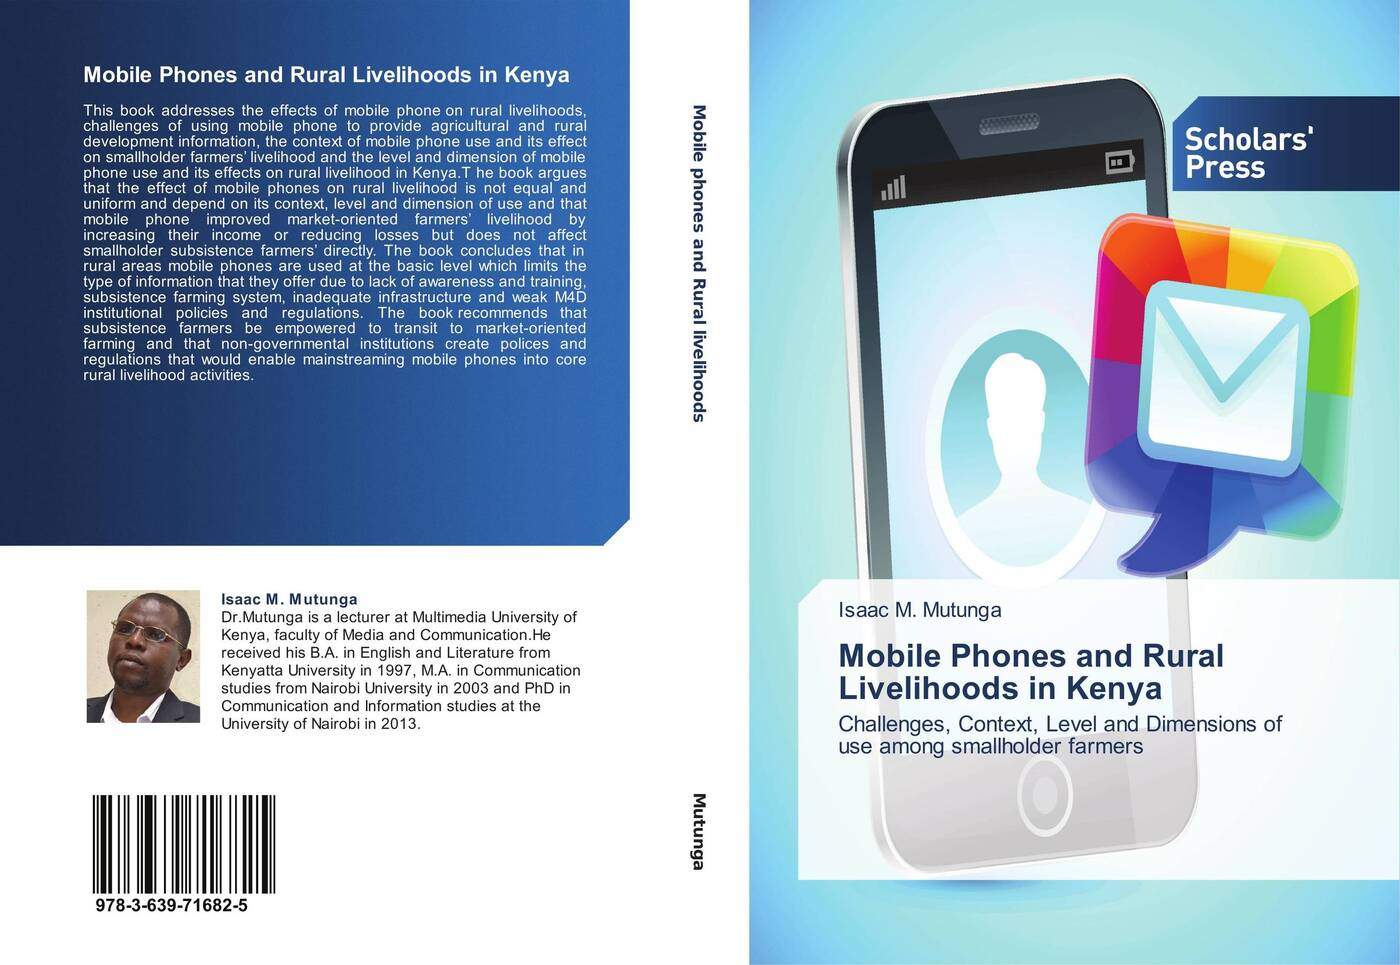 Isaac M. Mutunga Mobile Phones and Rural Livelihoods in Kenya role of social capital in rural livelihood promotion